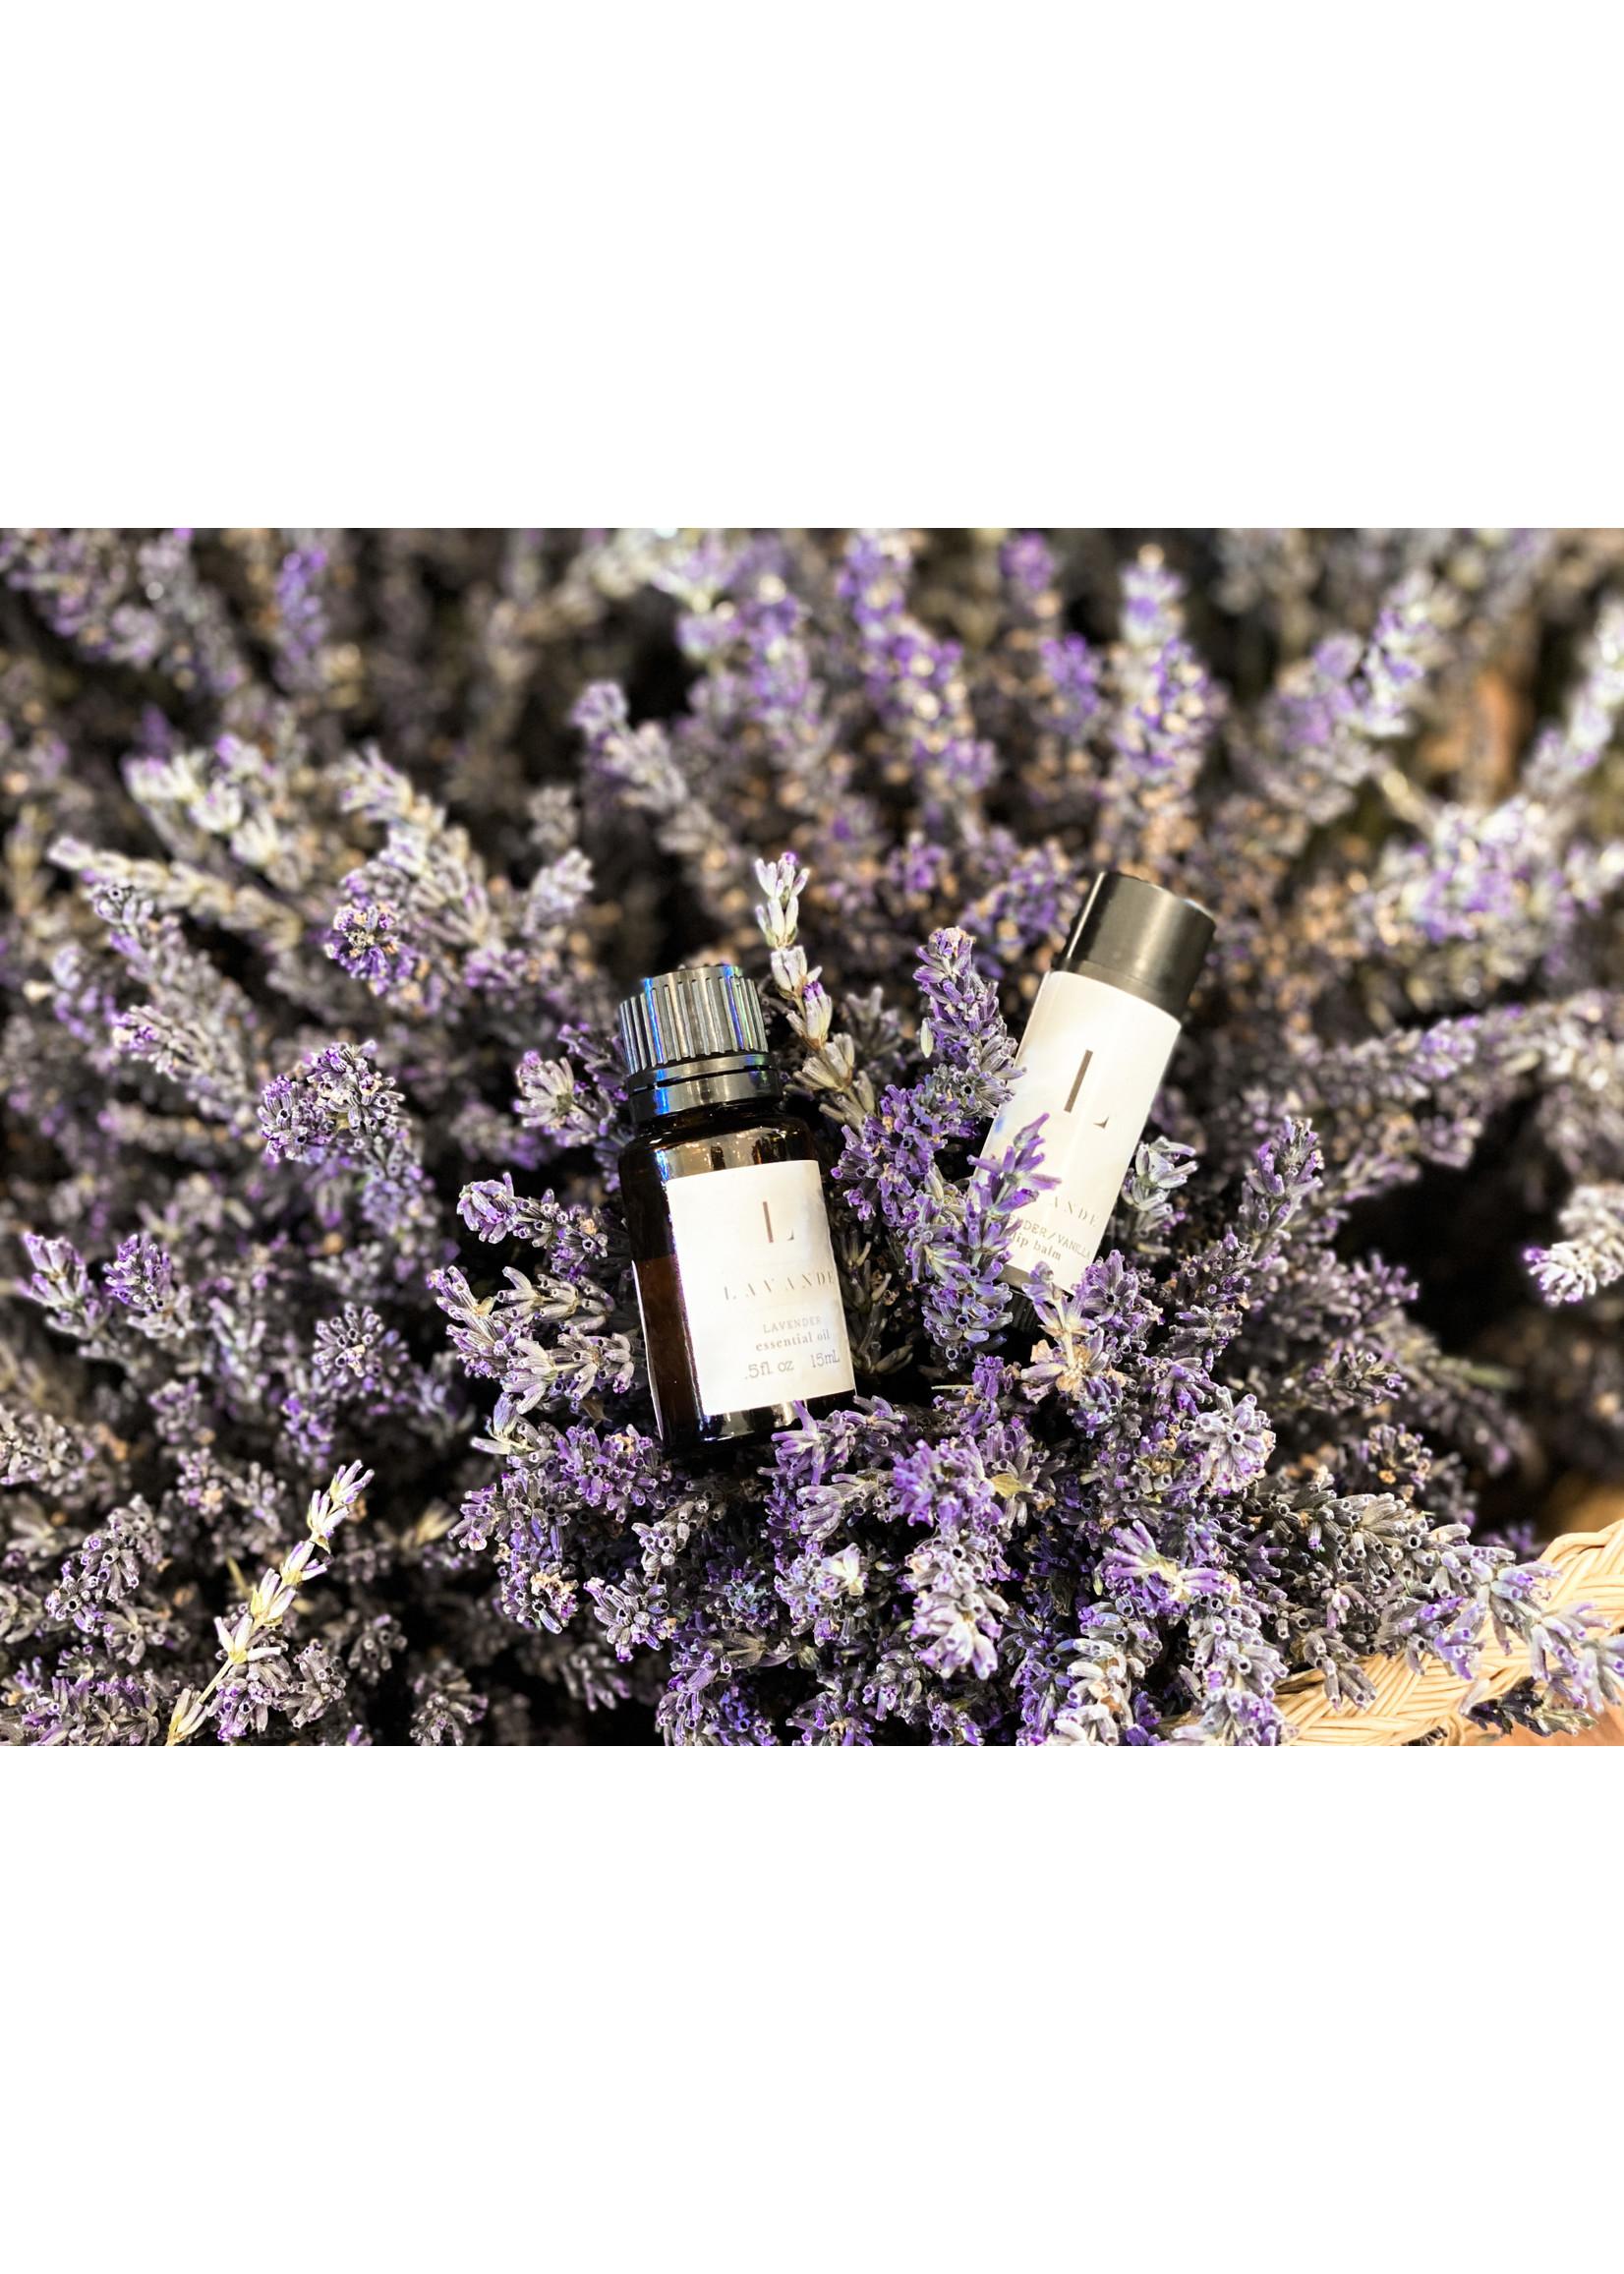 Lavande Farm Lavender Essential Oil